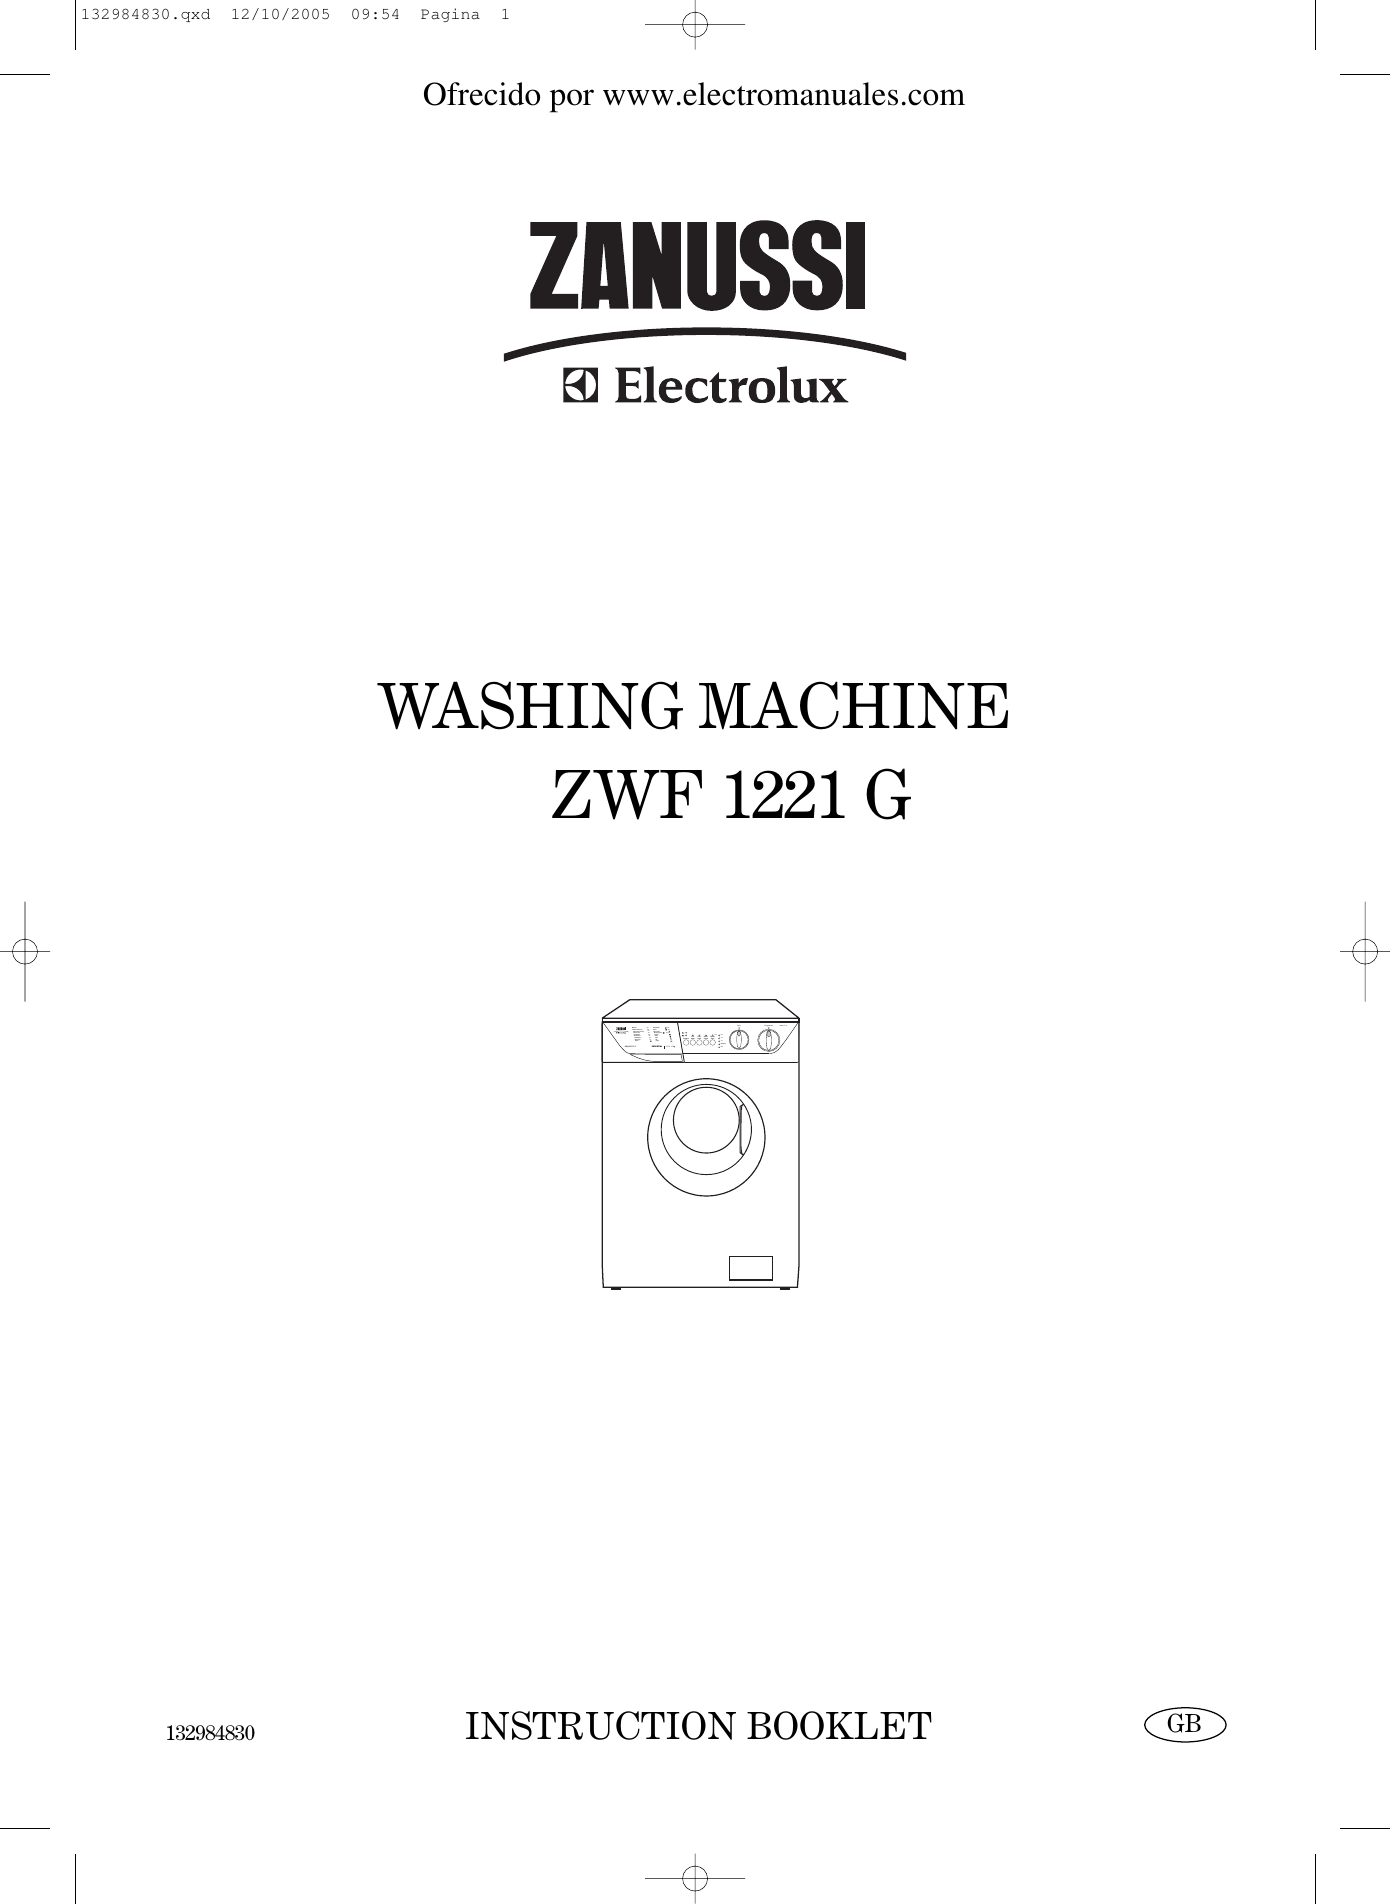 Zanussi Zwf 1221 G Users Manual 132984830 Washing Machine Drain Hose Additionally Wiring Diagram